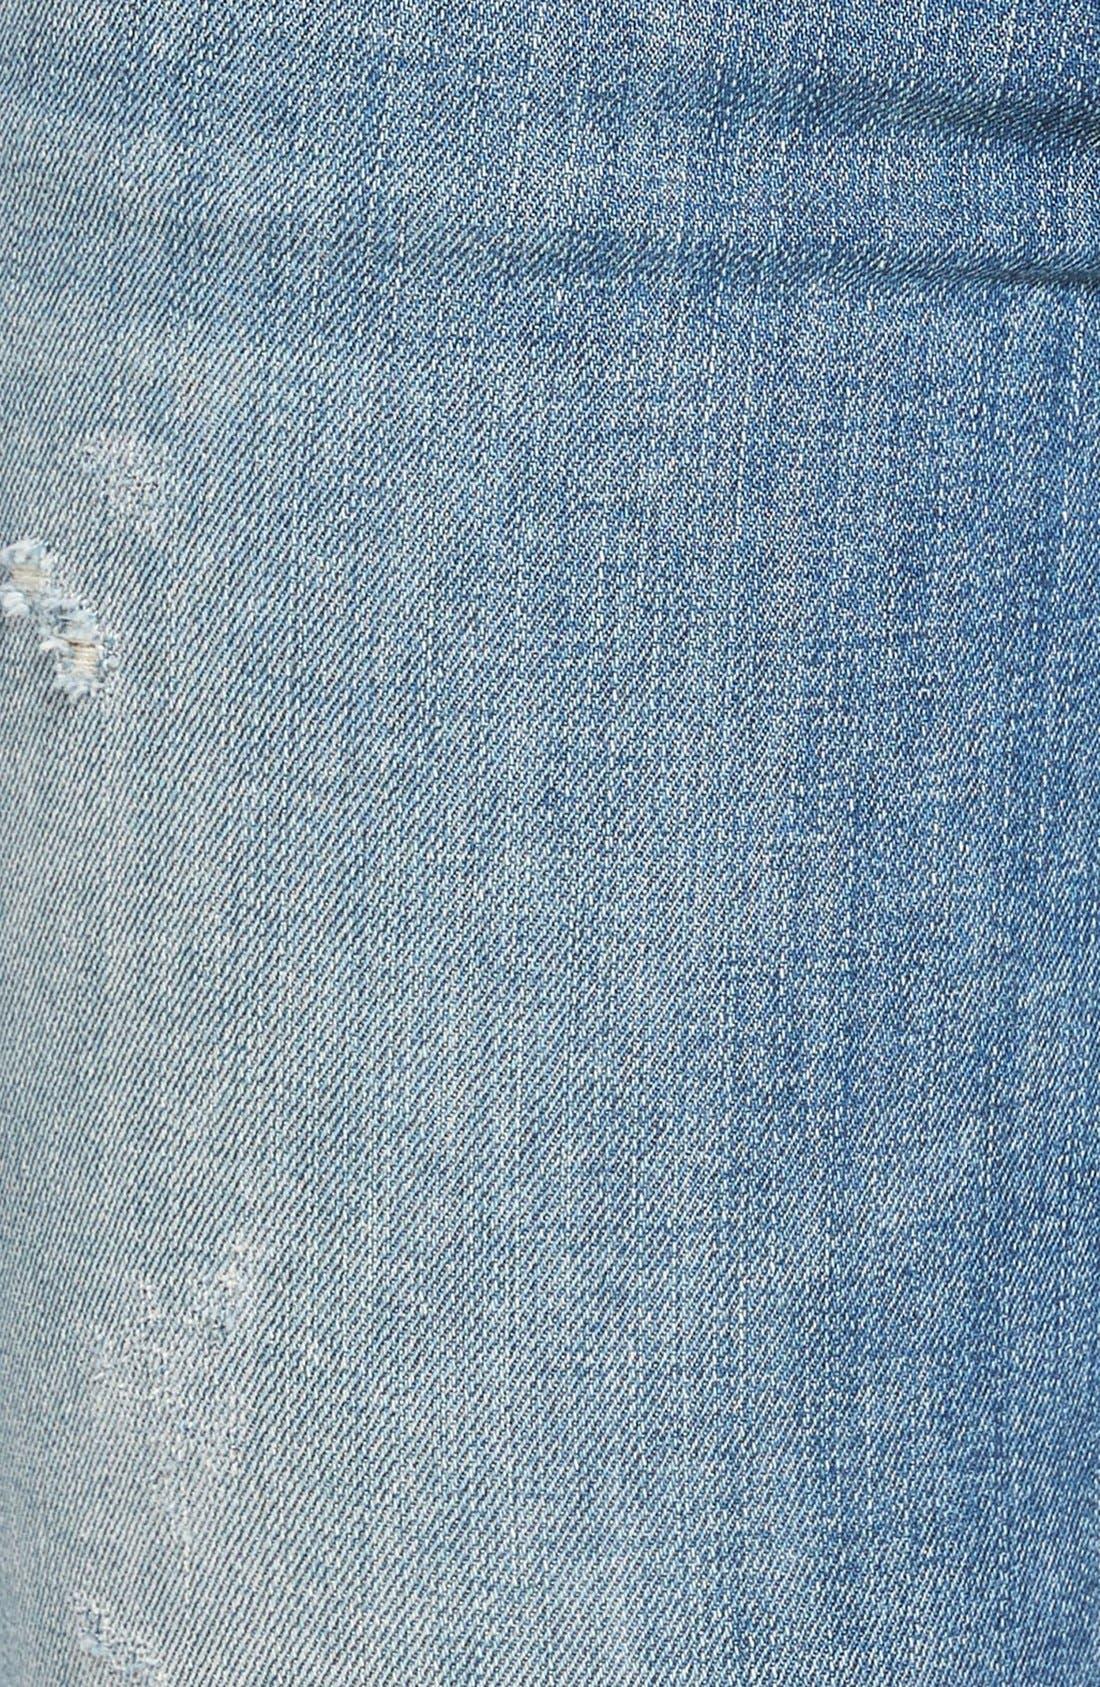 Alternate Image 5  - J Brand Ripped Crop Skinny Jeans (Mischief)